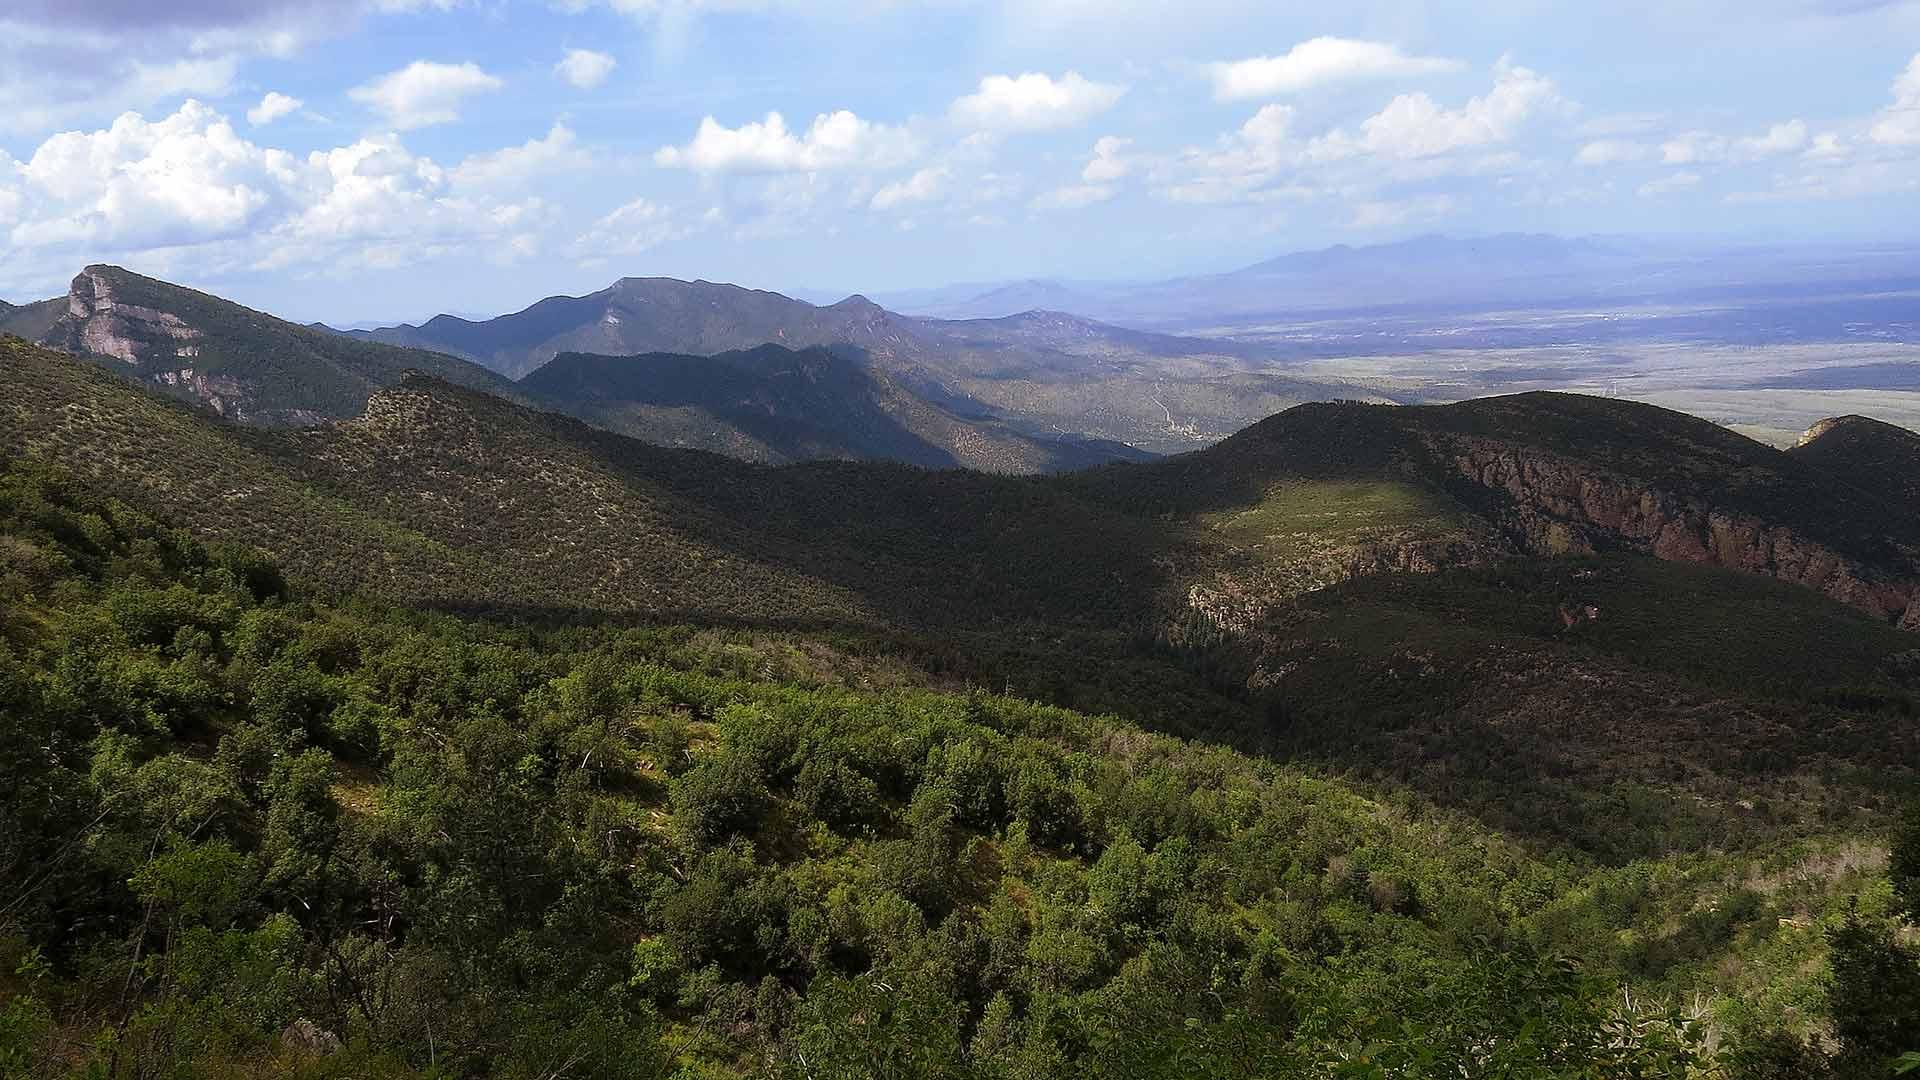 Panorama to illustrate dating in sierra vista